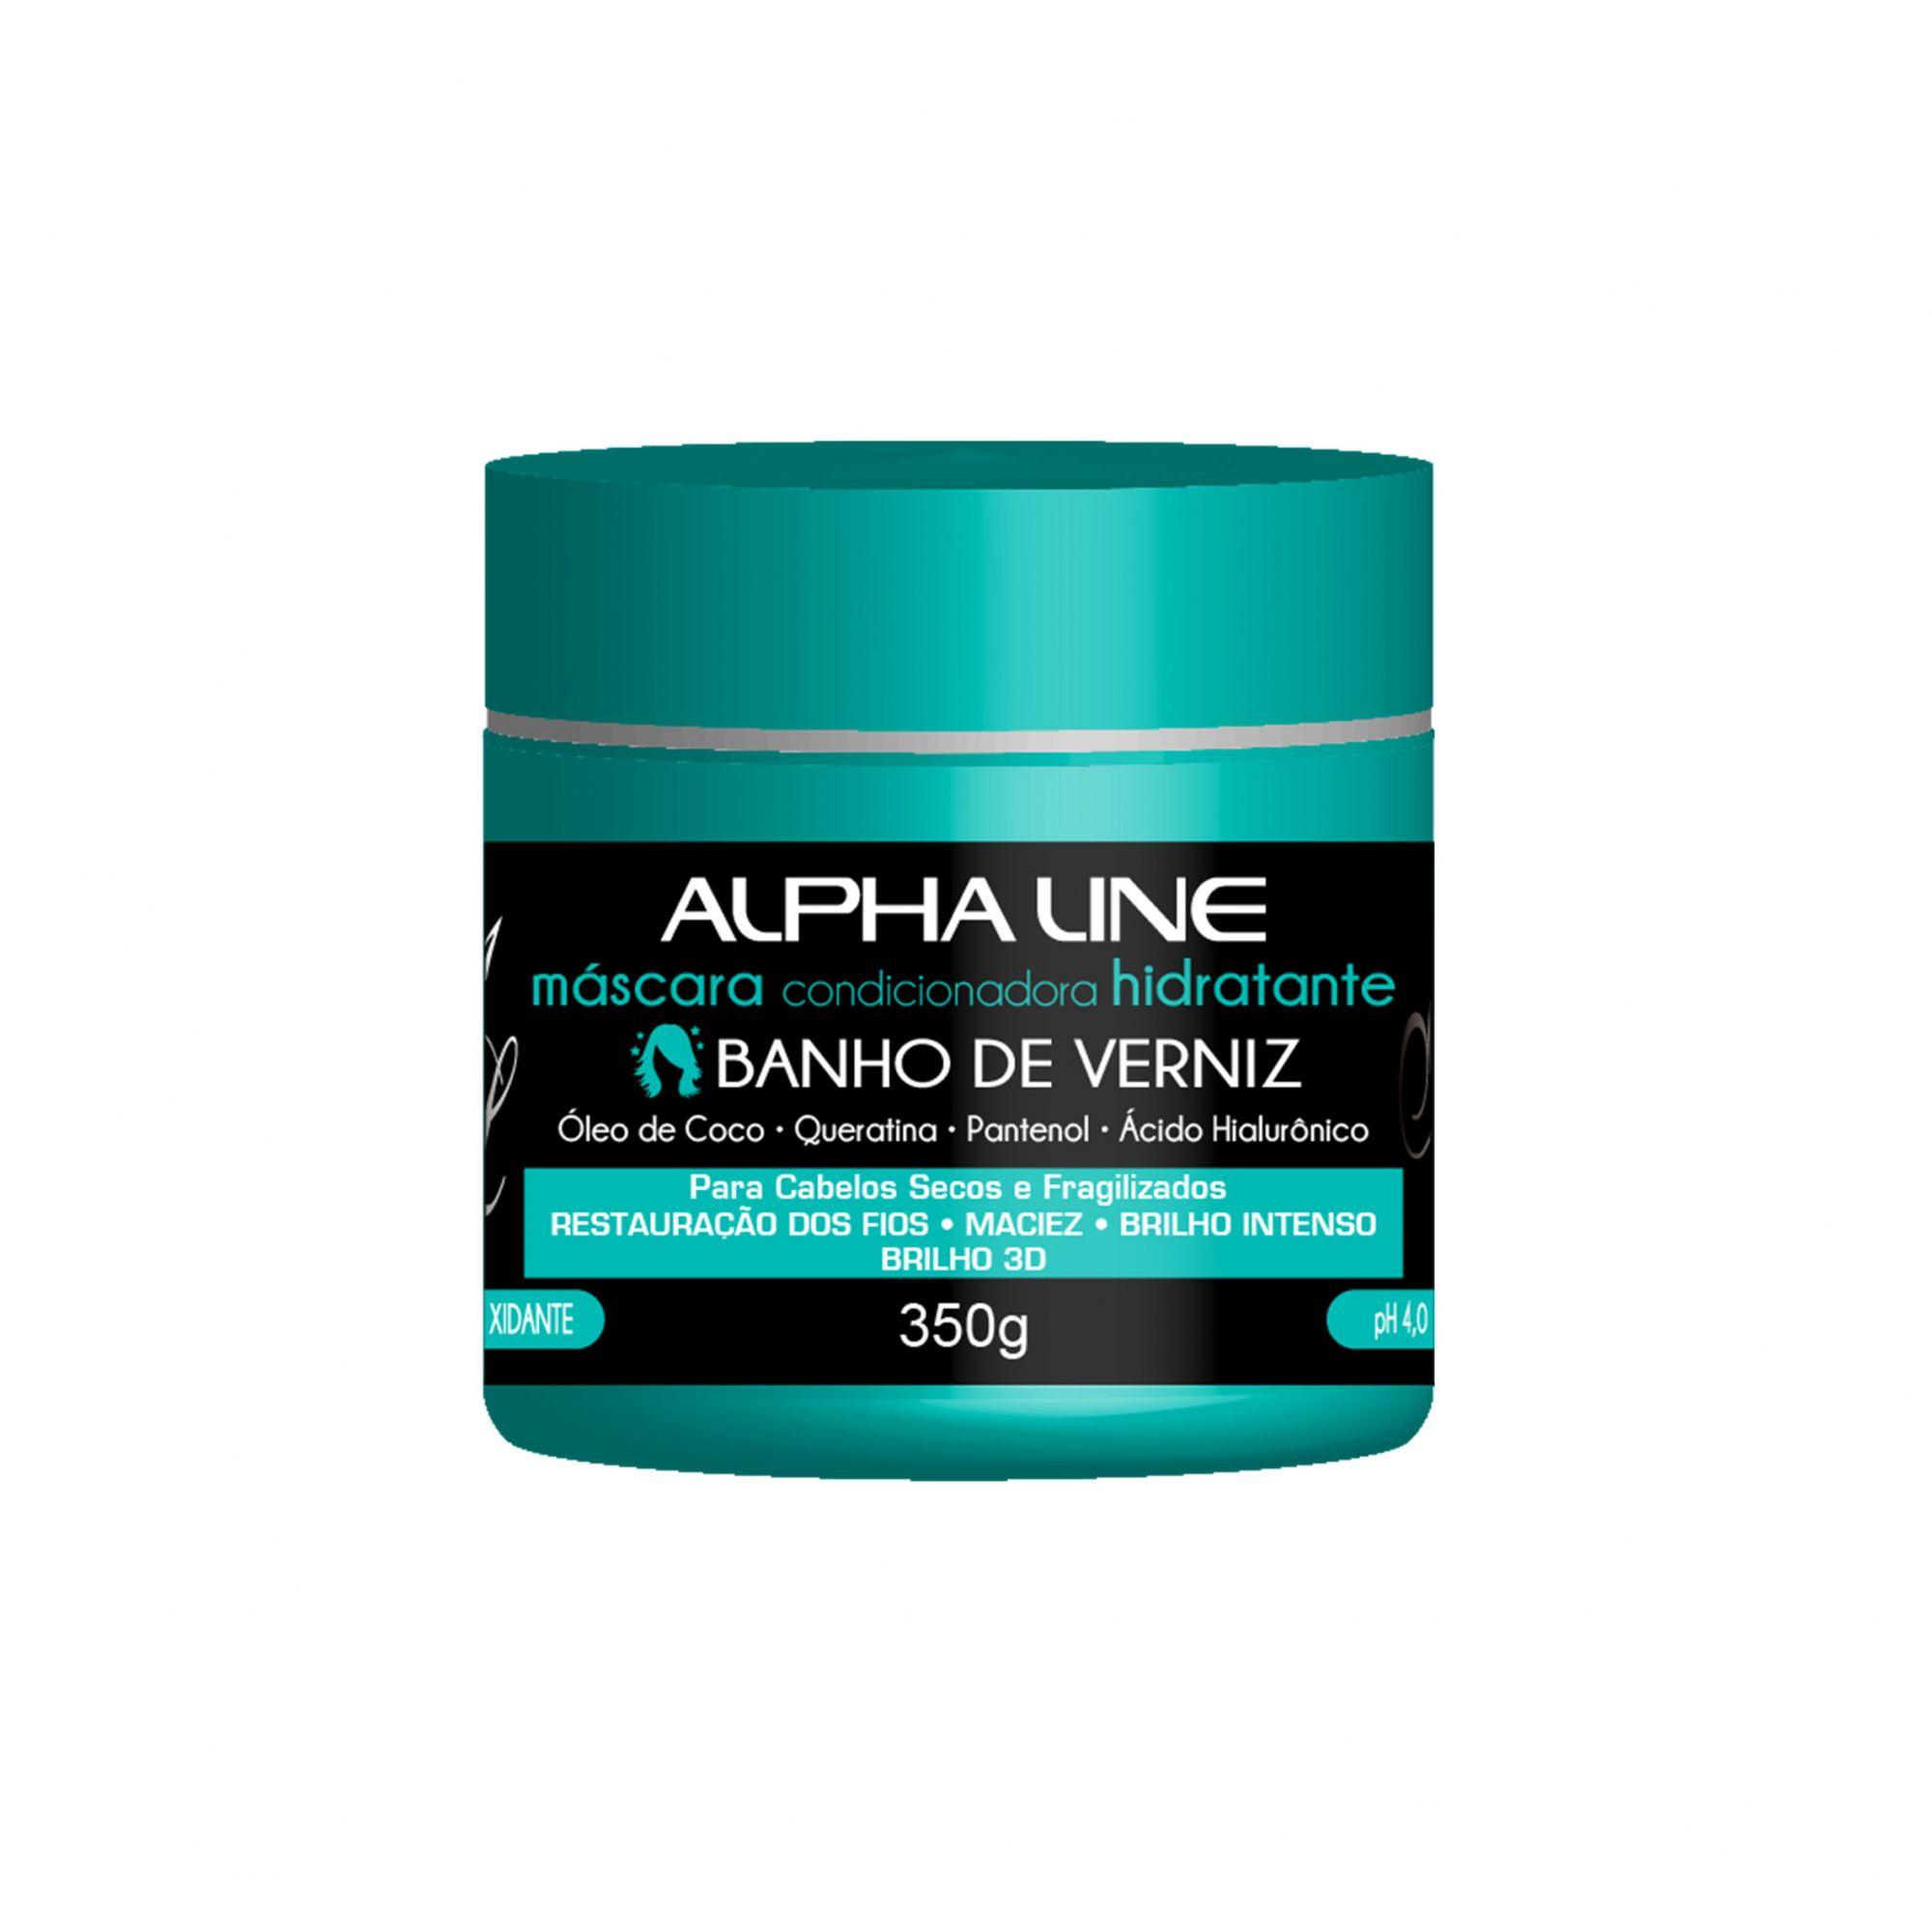 Alpha Line Máscara Condicionadora Banho de Verniz 350ml.